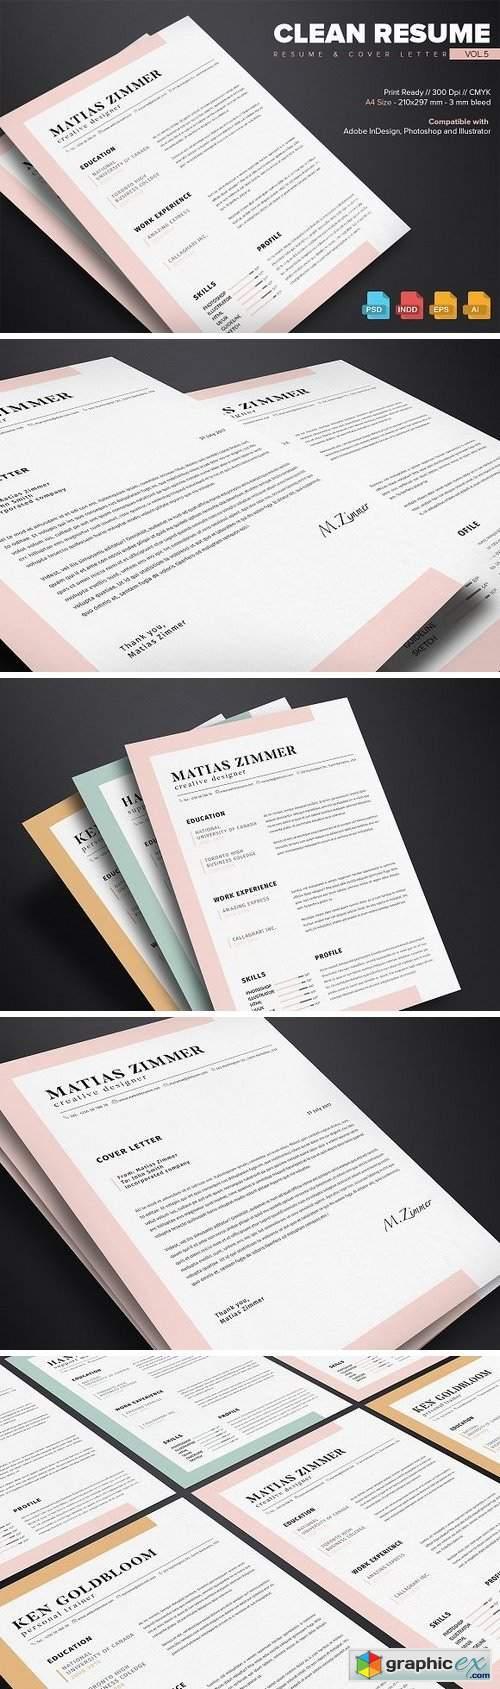 resume and cv  u00bb page 2  u00bb free download vector stock image